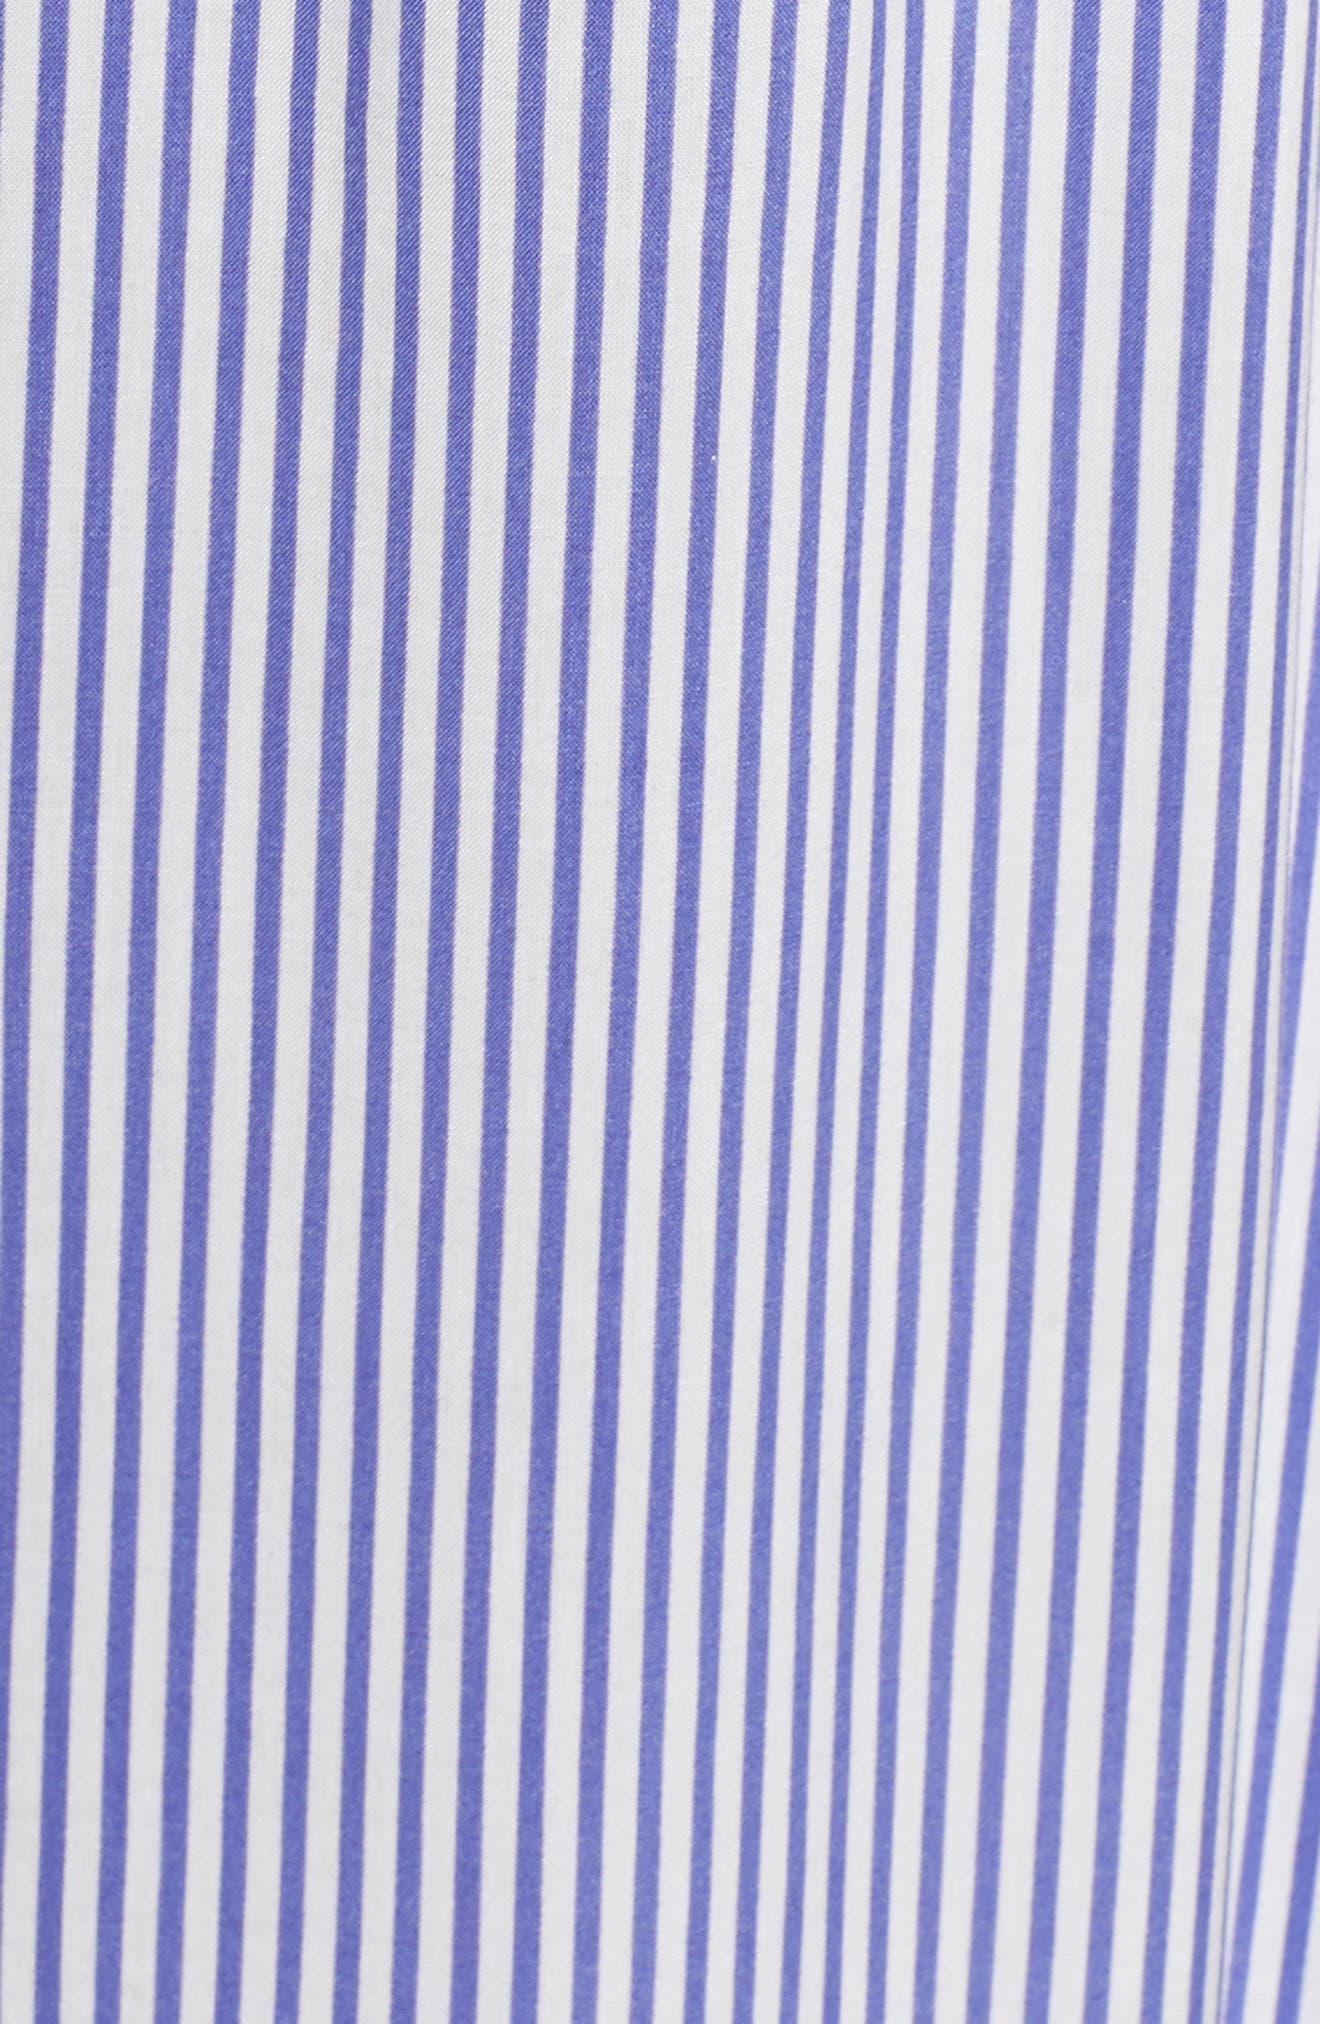 Stripe Cold Shoulder Maxi Dress,                             Alternate thumbnail 6, color,                             400